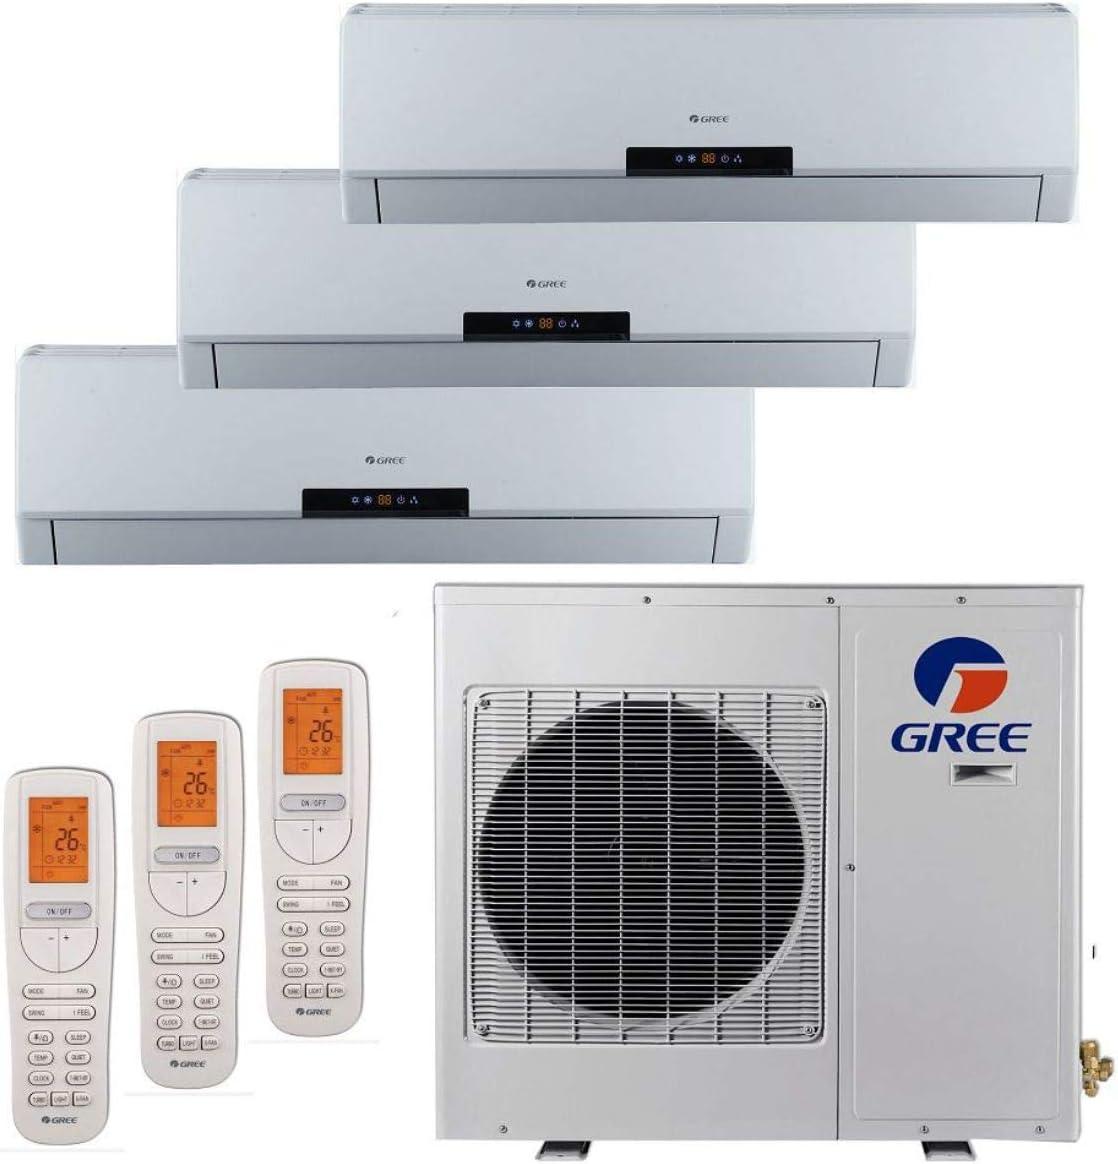 Gree MULTI24BNeo301-24,000 BTU Multi Tri-Zone Wall Mount Mini Split A C Heat Pump 208-230V 9-9-12 A C Heater